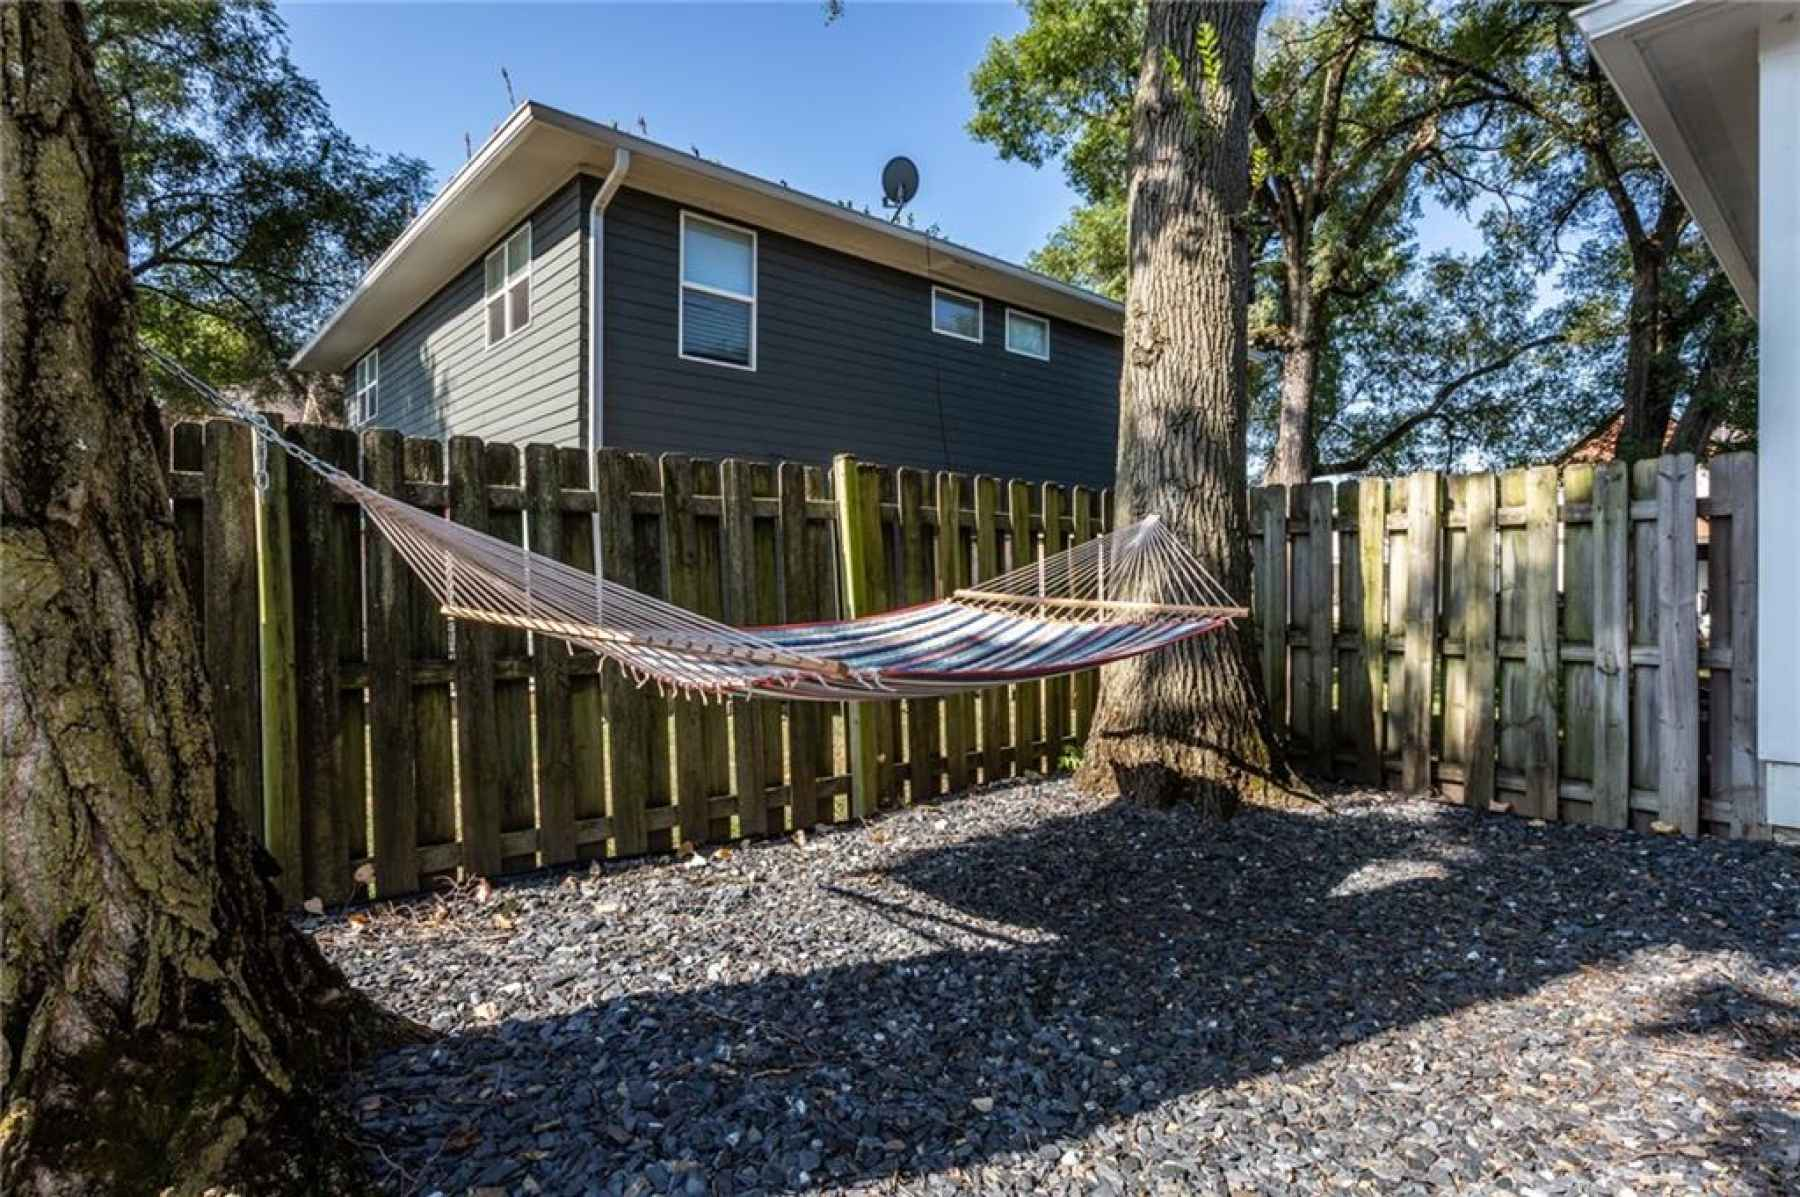 Backyard hammock area.